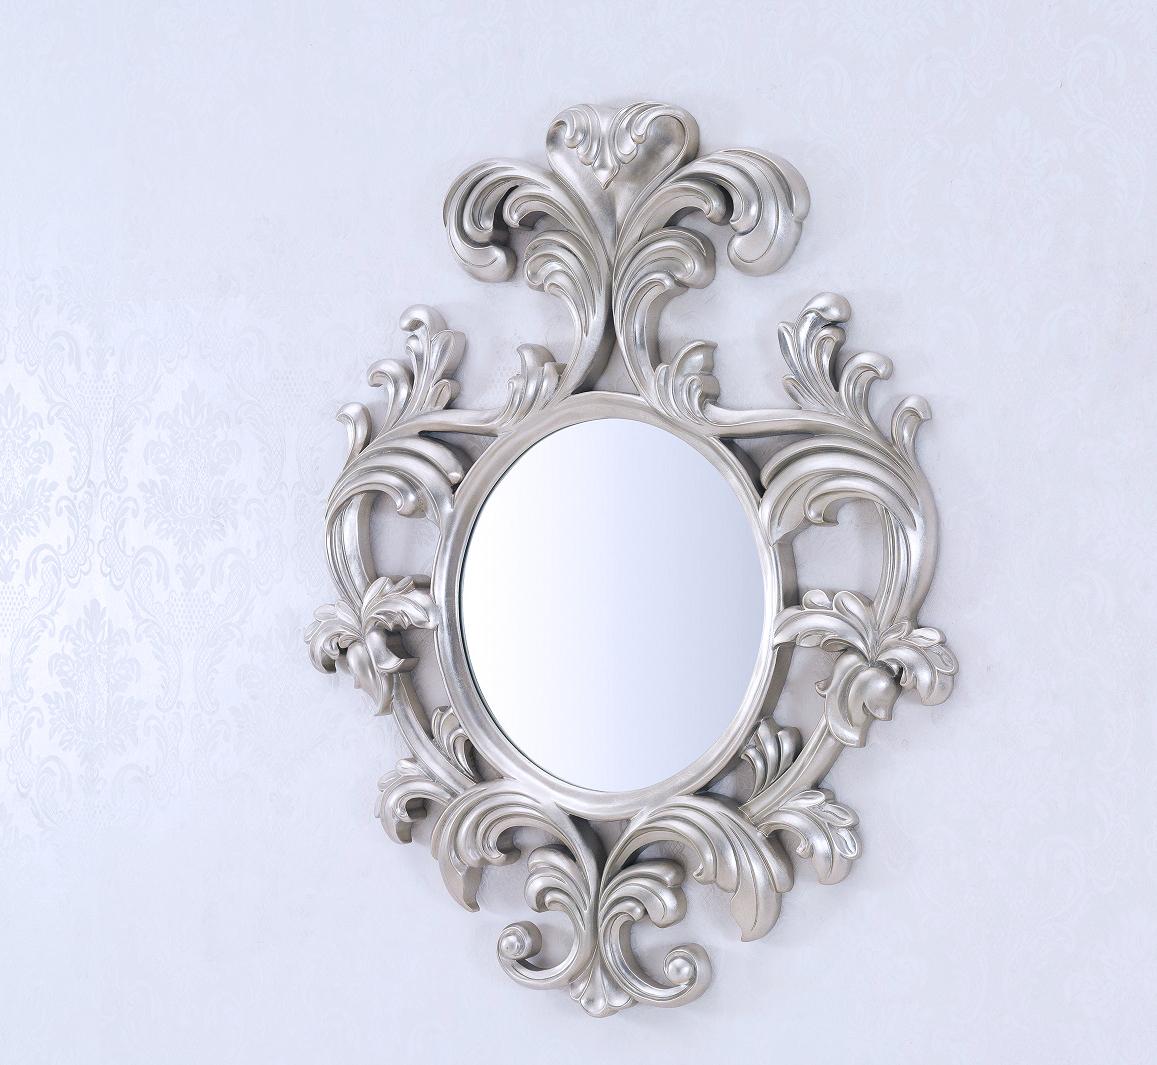 Decorative Wall Mirror – Geneve Silver Throughout Popular Small Decorative Wall Mirrors (Gallery 17 of 20)